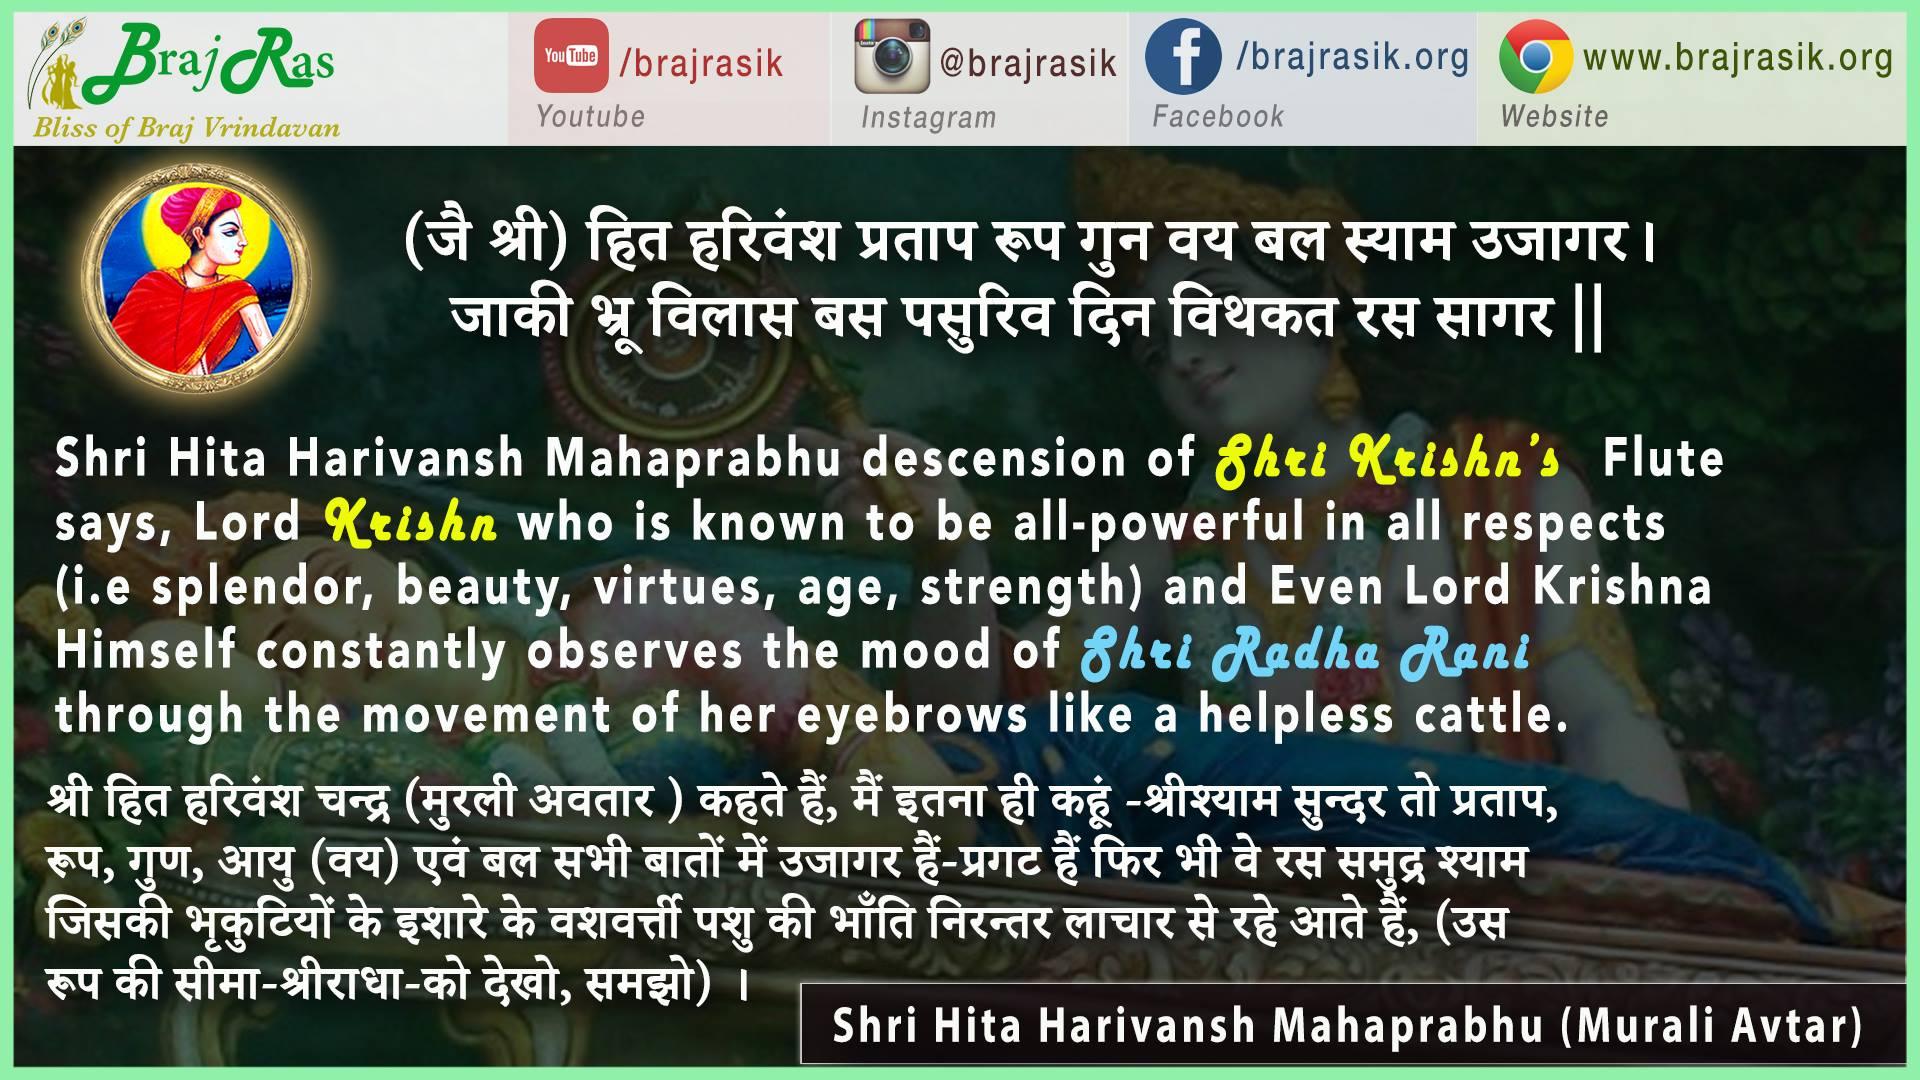 (Jai Shri) Hit Harivansh Prataap Roop Gun Vay Bal Syaam Ujagar - Shri Hita Harivansh Mahaprabhu, Hit Chaturasi (52)